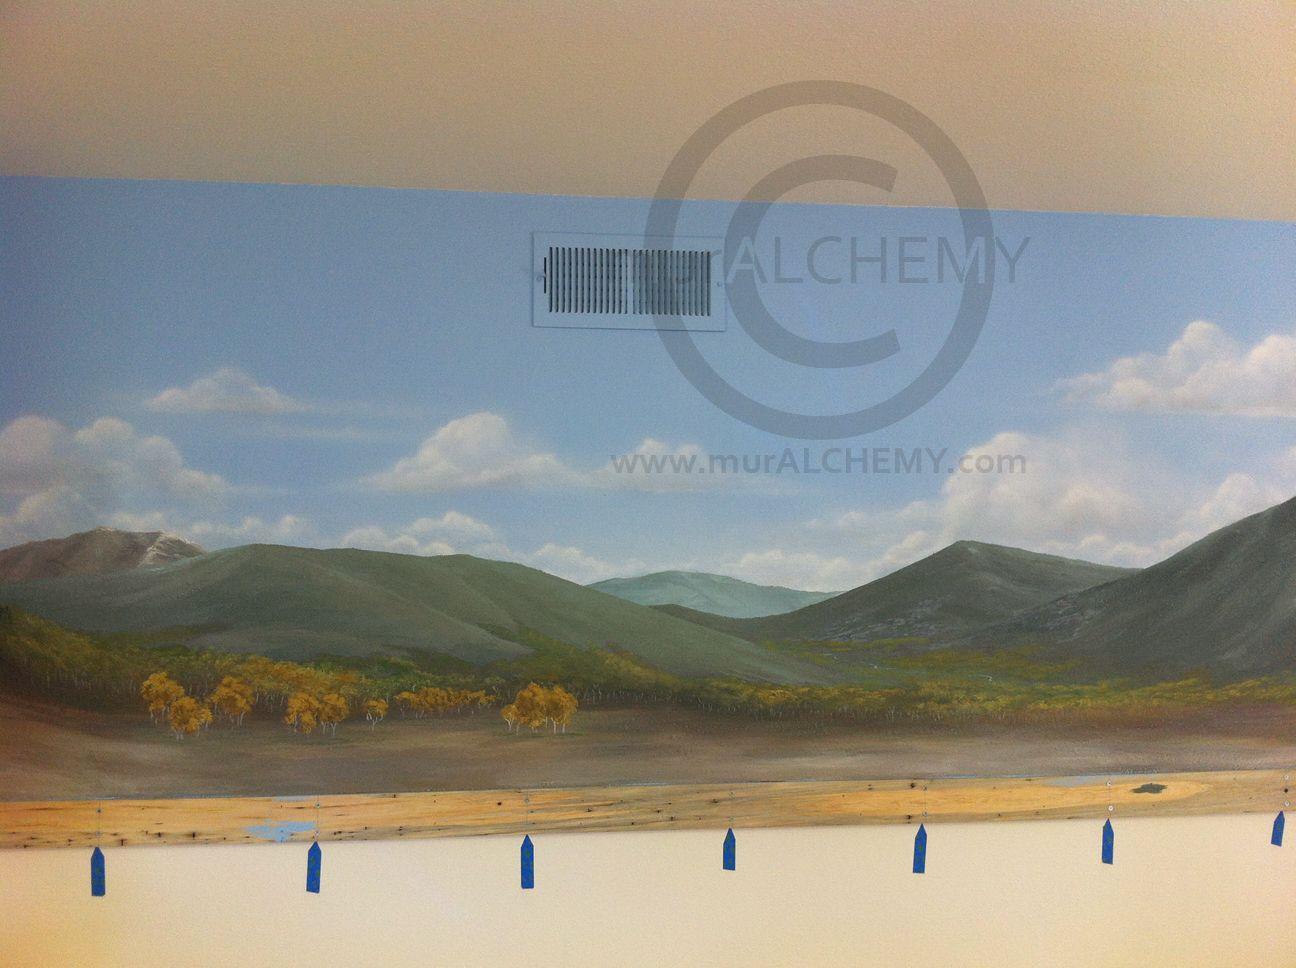 Model scale train background backdrop mural realistic - Model railroad backdrops ...